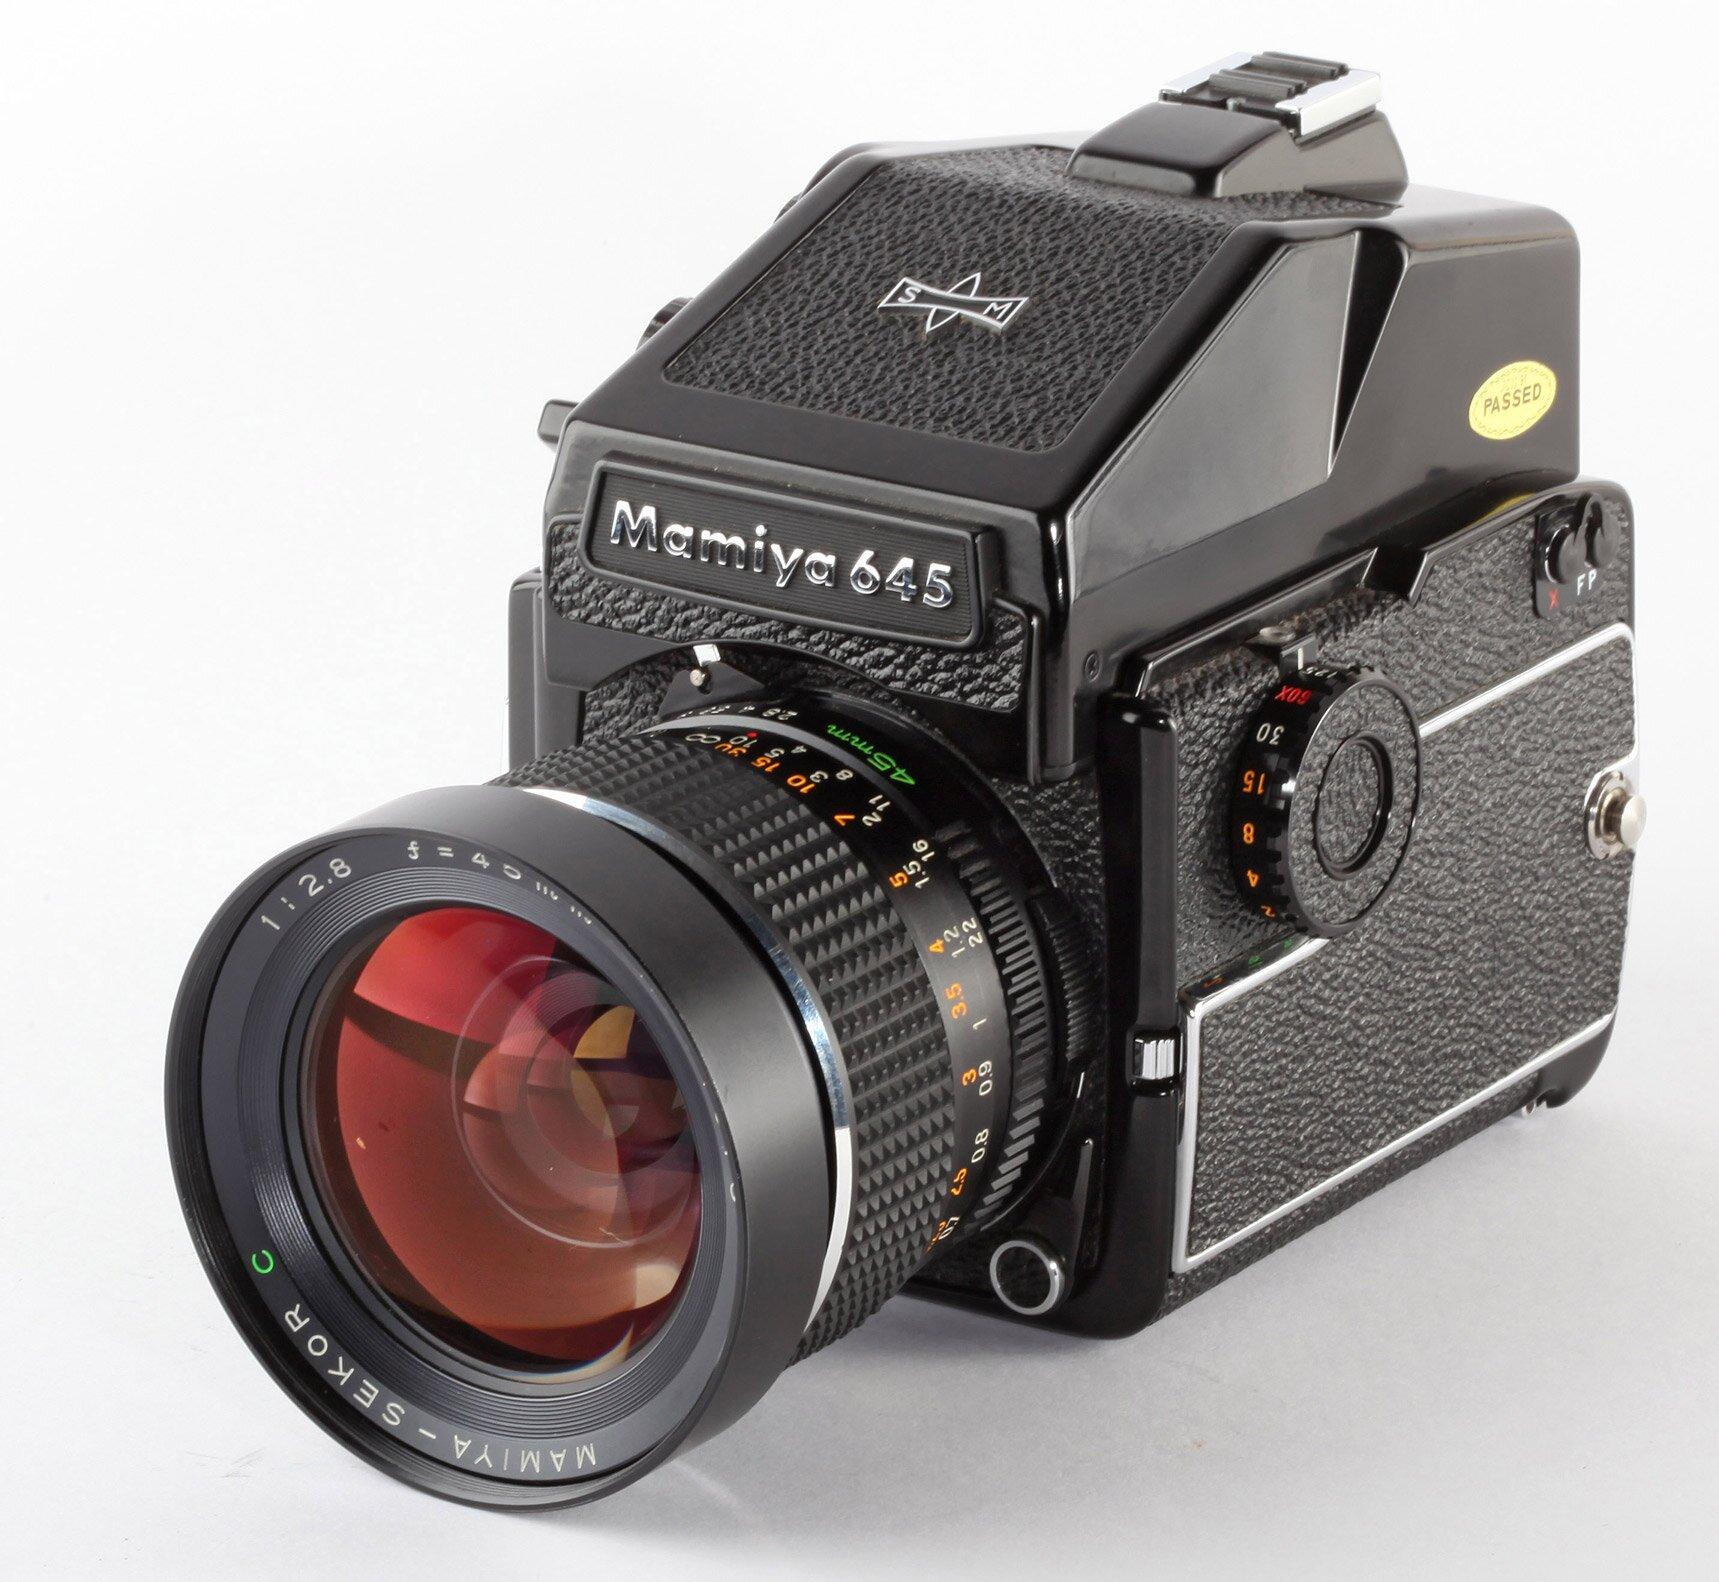 Mamiya M645 1000S PD Prisma 2,8/45mm Set